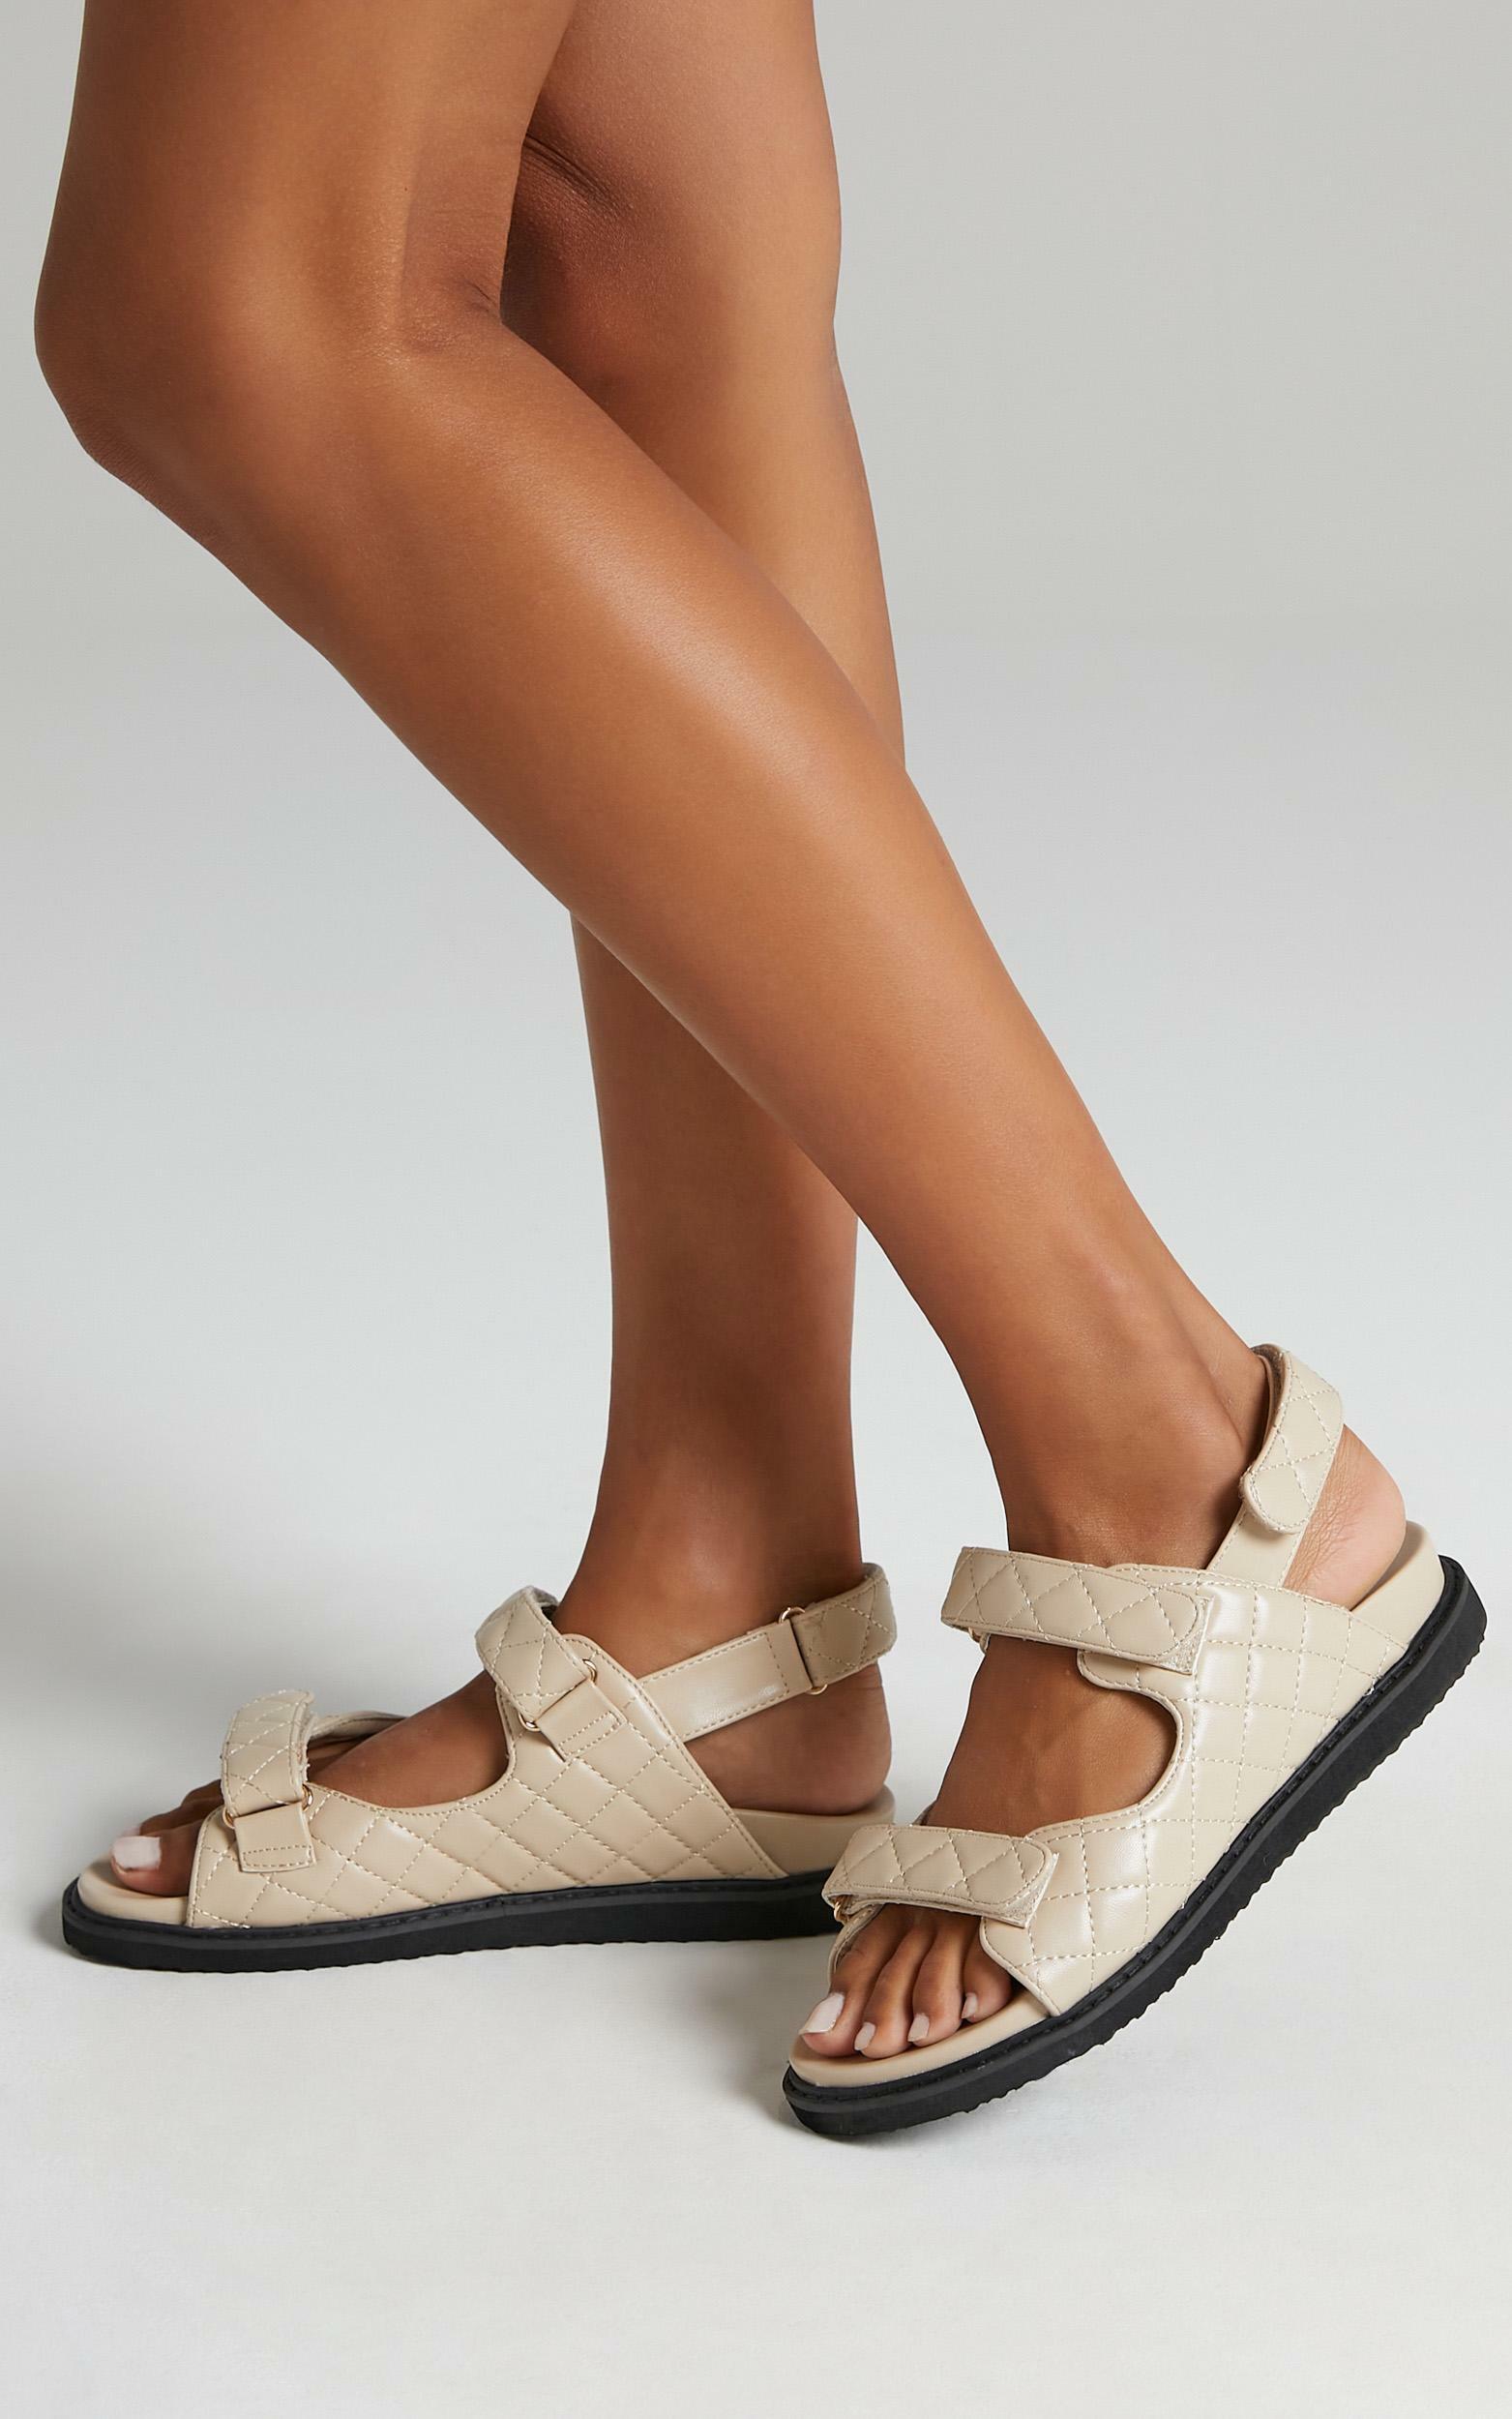 Billini - Zora Sandals in Light Taupe - 5, Beige, hi-res image number null